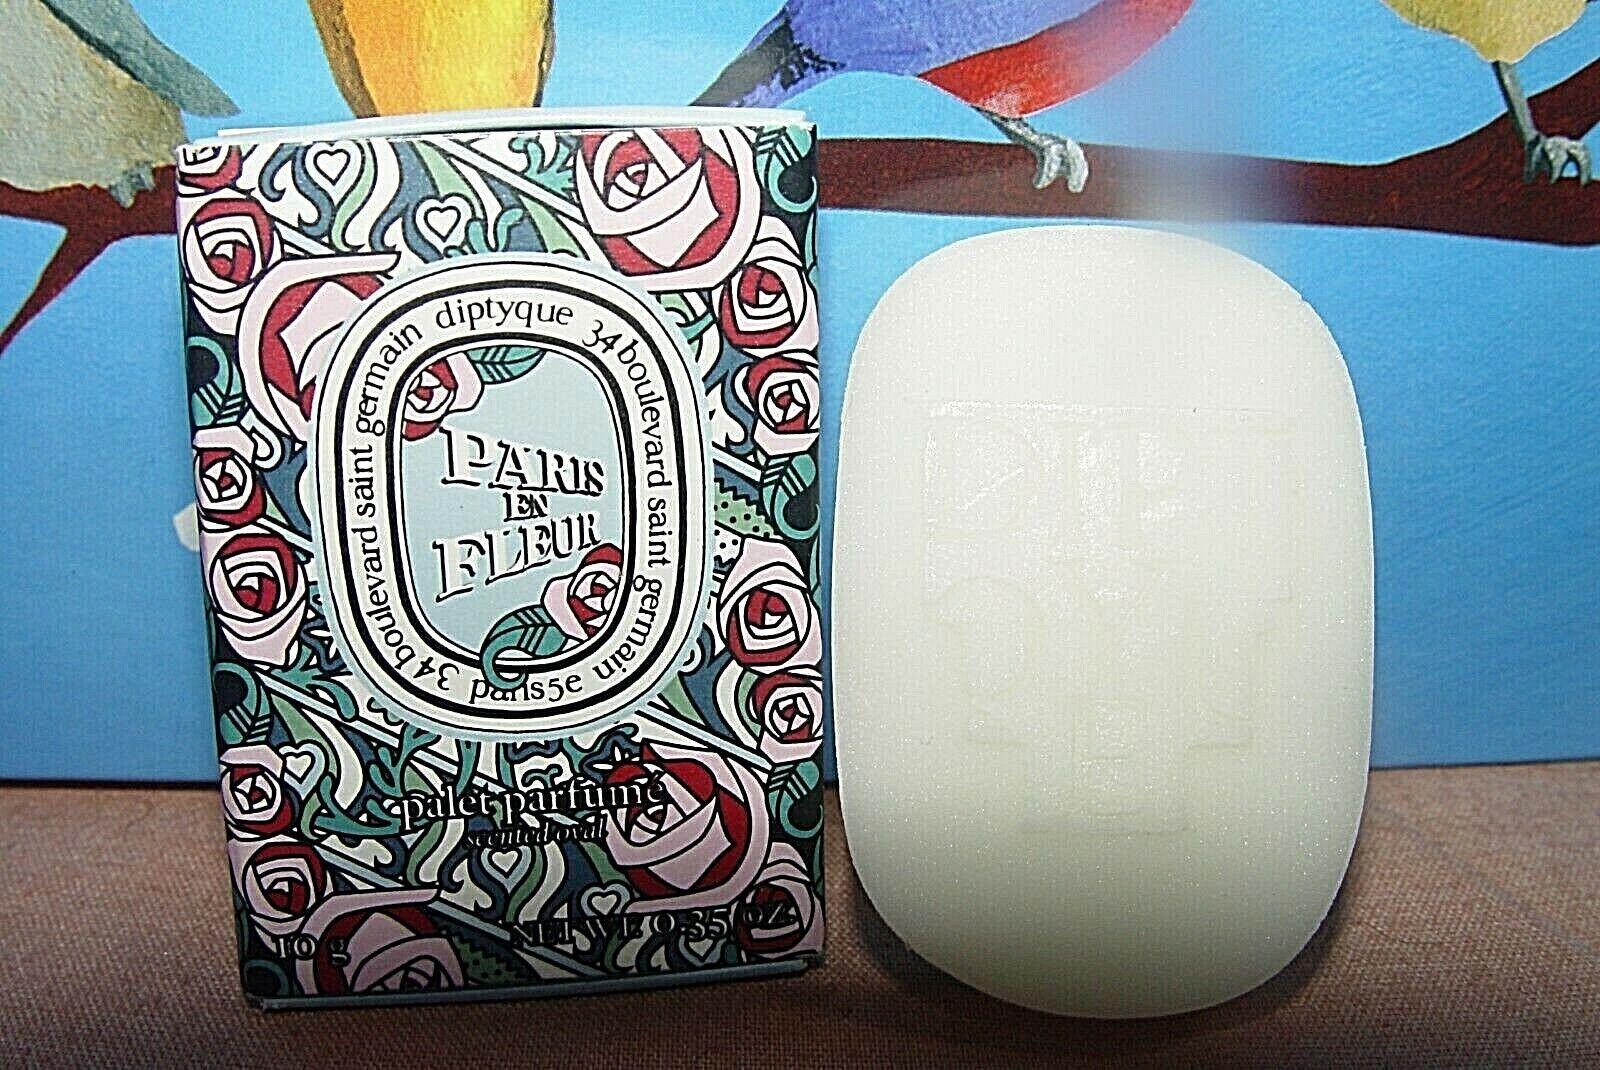 Diptyque Paris En Fleur Perfumed Oval Wax Miniature 10g/.35oz - $16.98